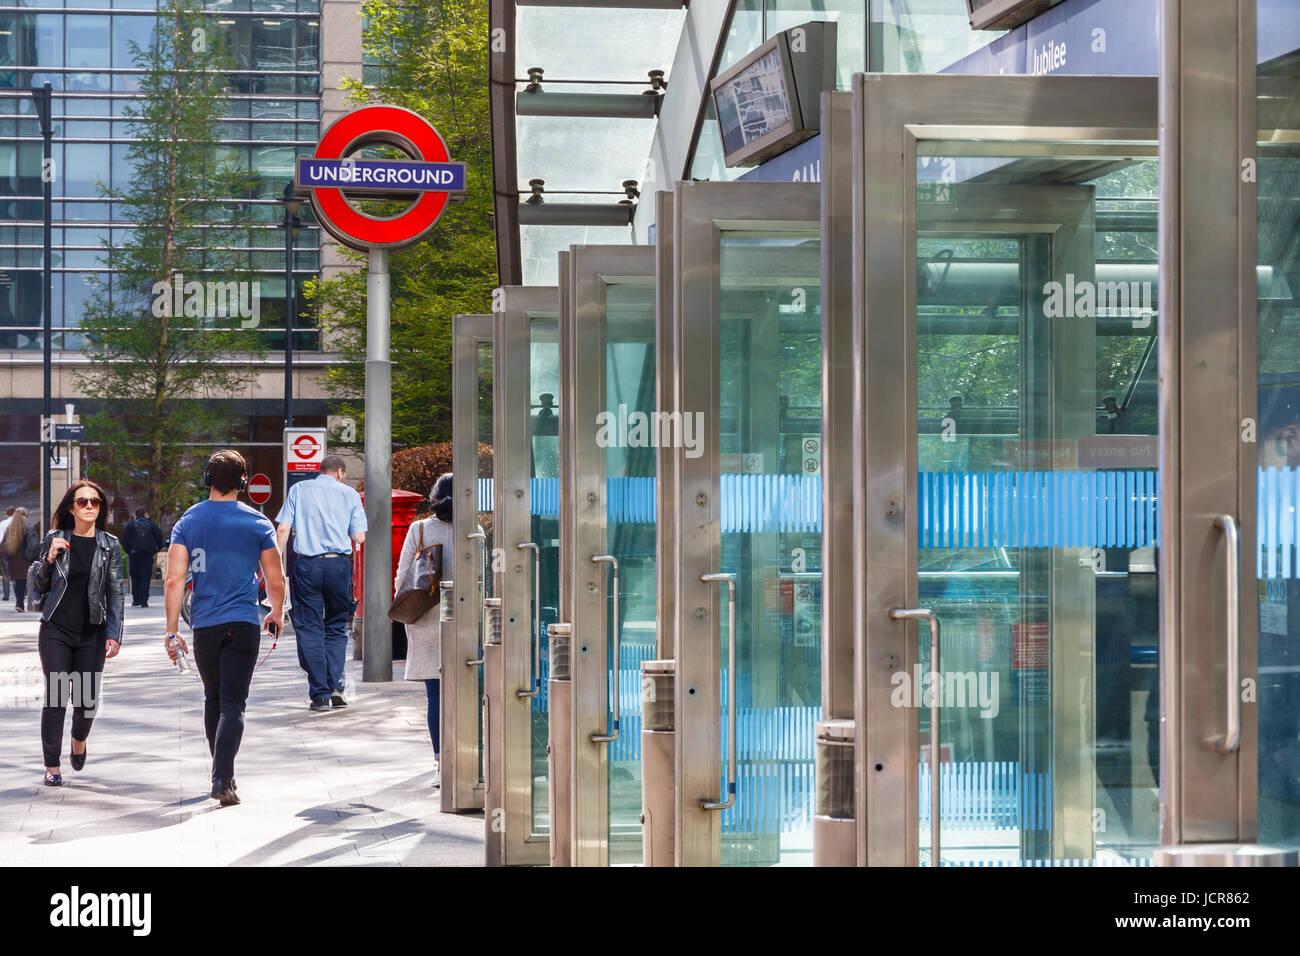 London, UK - May 10, 2017 - East entrance to Canary Wharf underground station Stock Photo